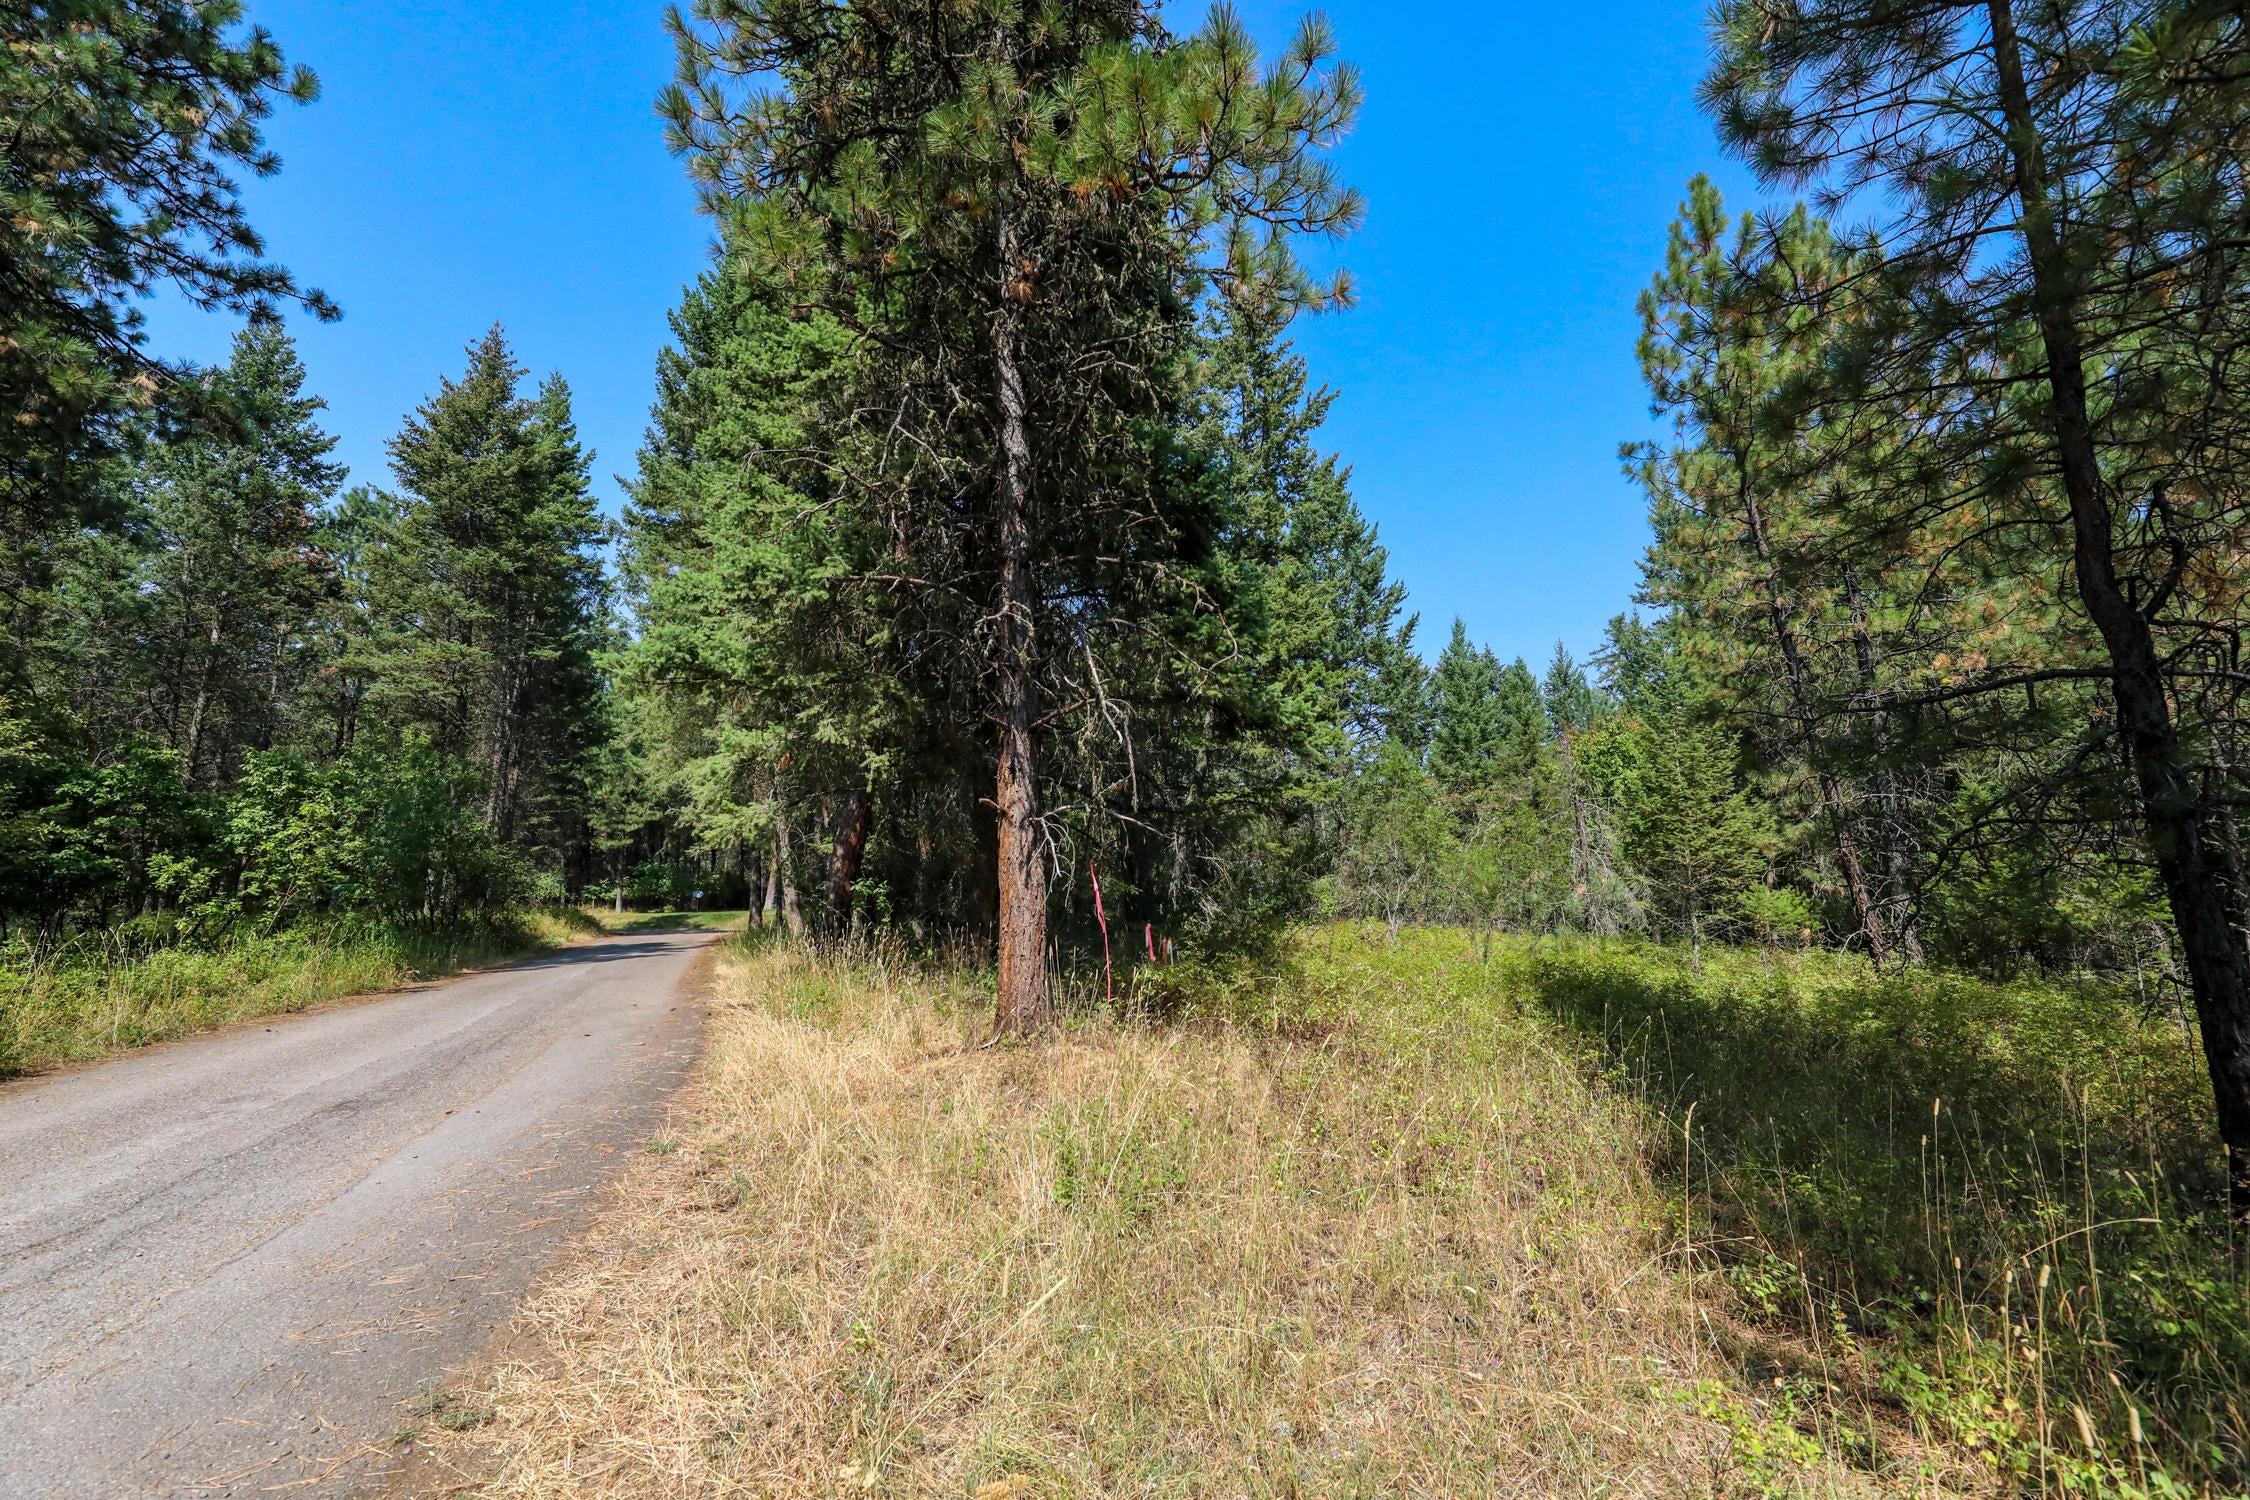 740 Peaceful Drive, Bigfork, MT 59911